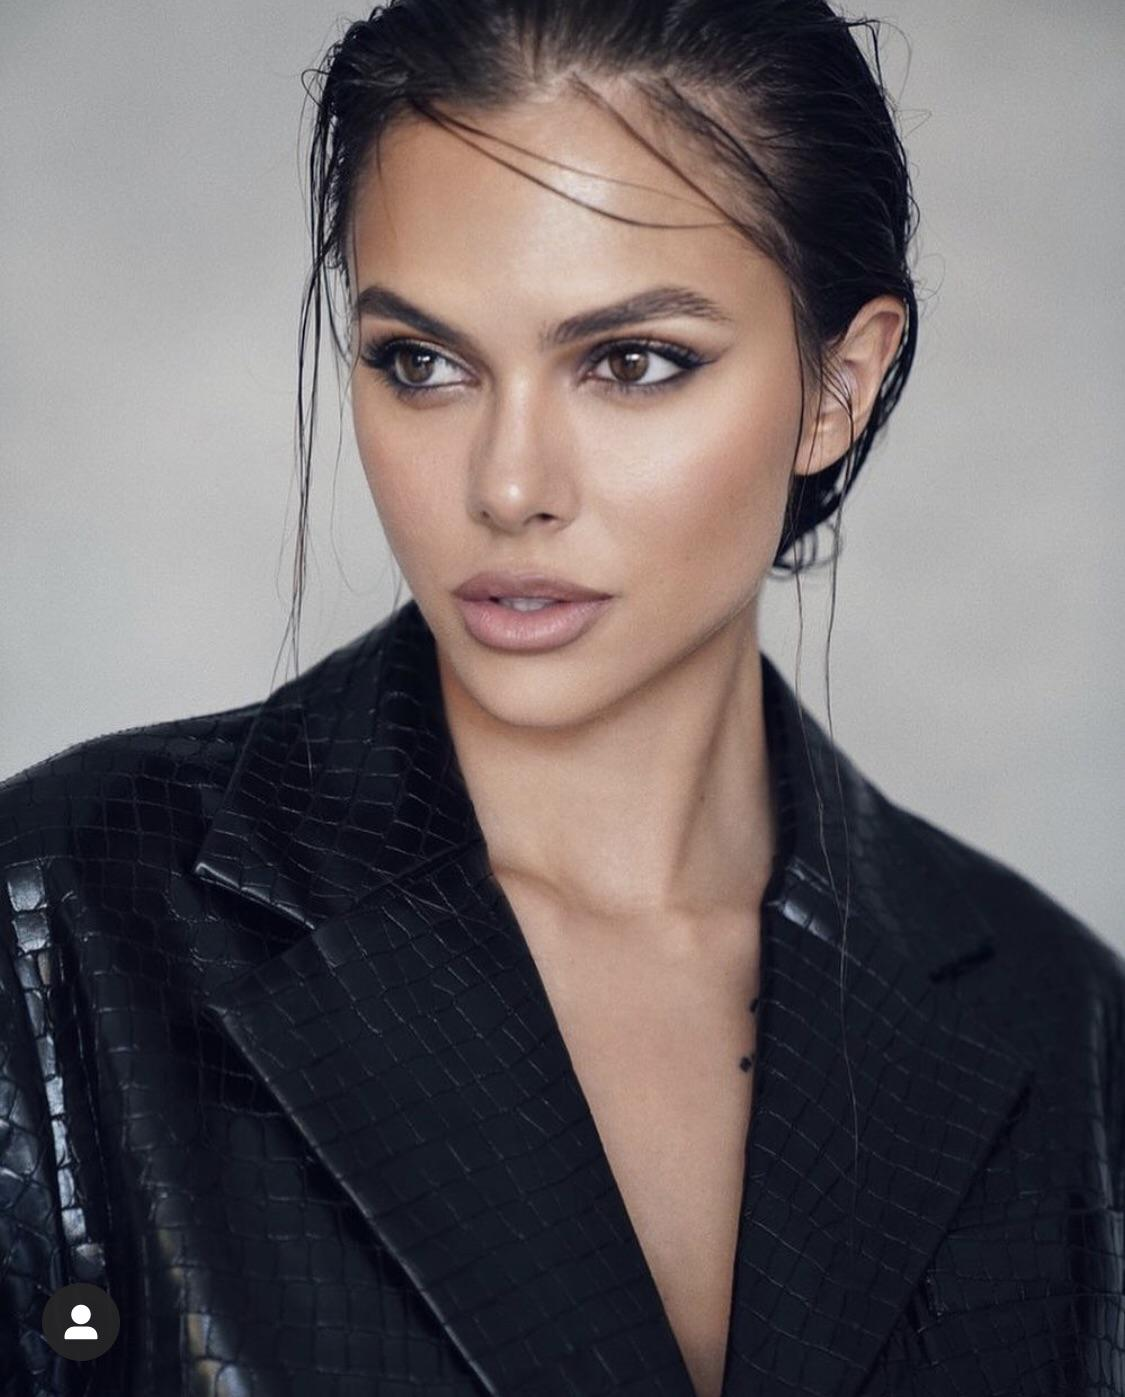 Viki's Profile Pic